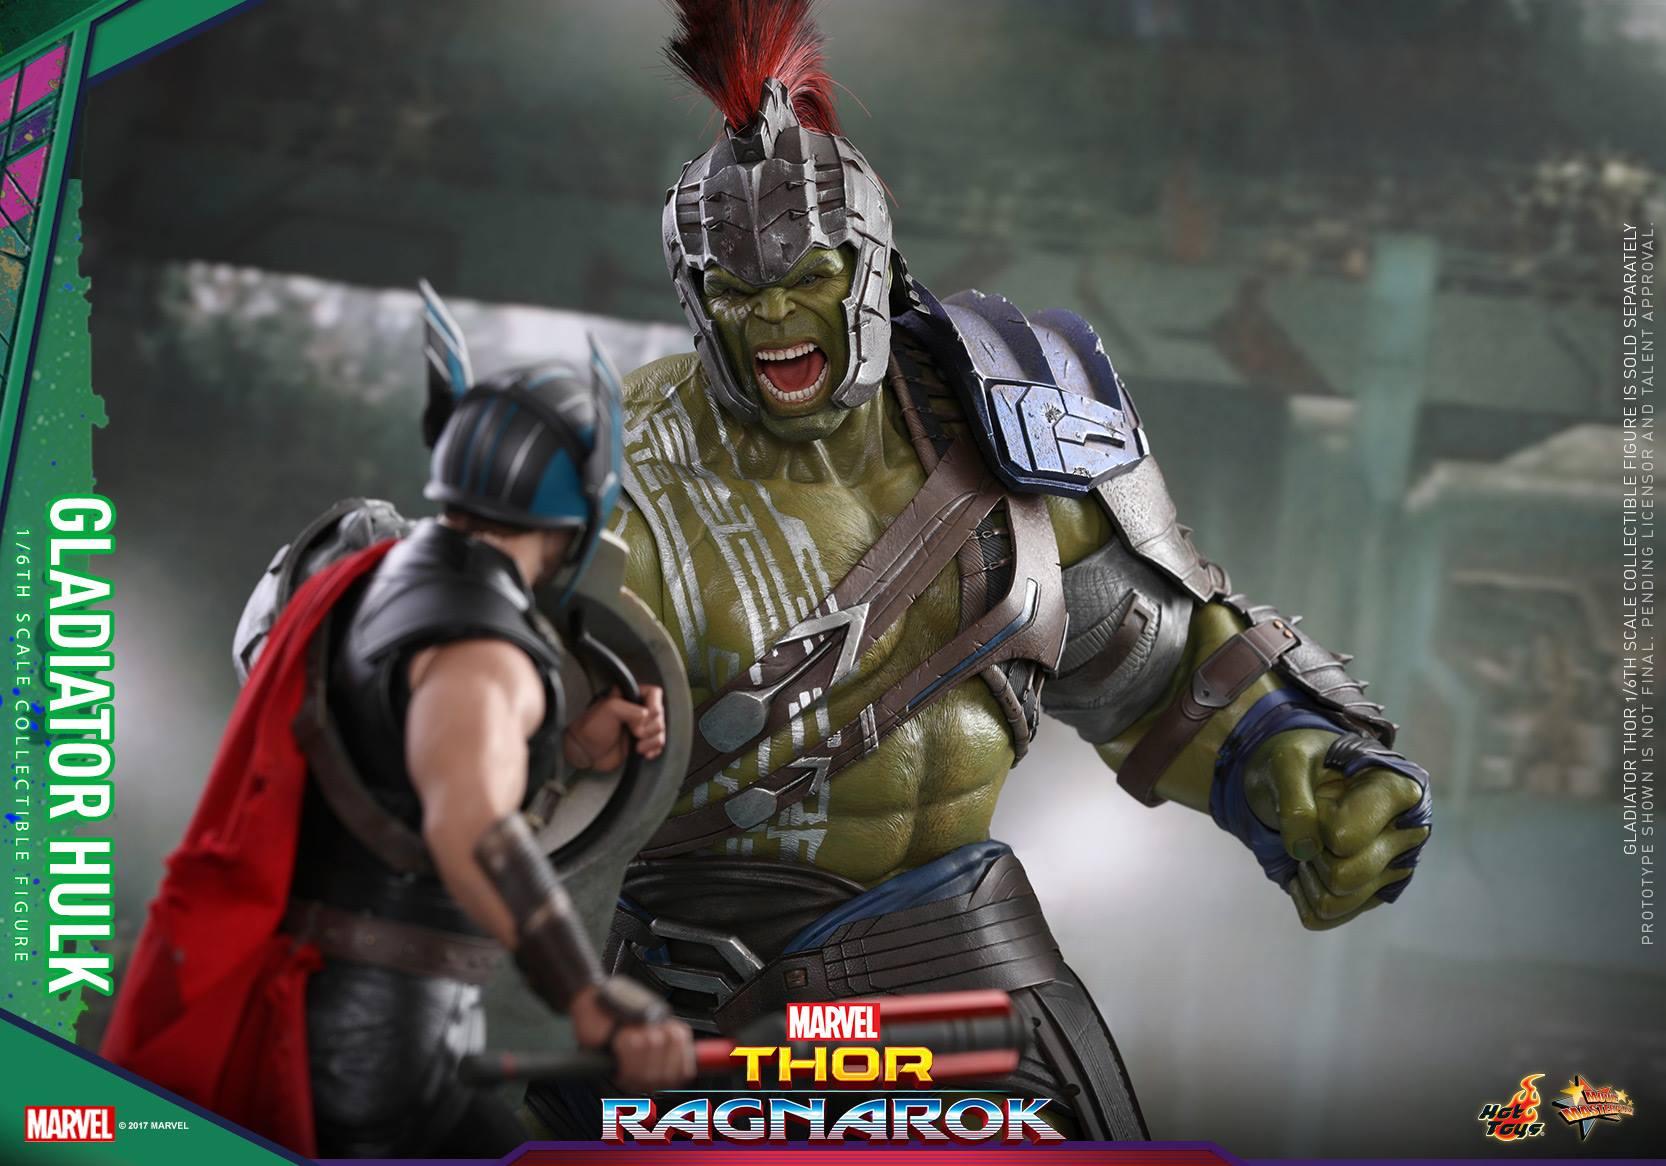 Hot Toys Thor: Ragnarok Hulk & Thor Sixth Scale Figure Pre-Orders